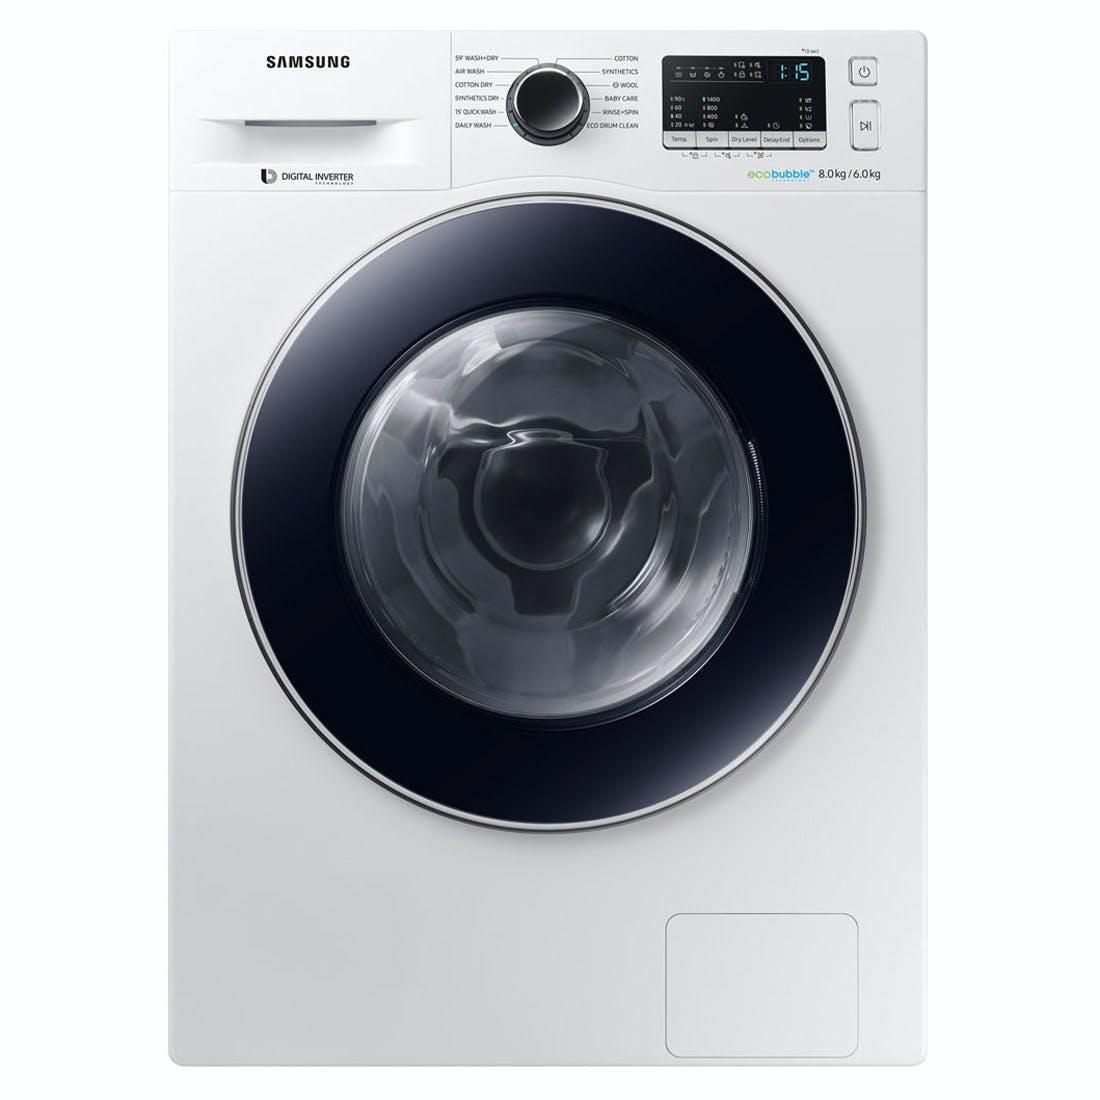 samsung wd80m4b53jw eco bubble washer dryer in white 1400rpm 8kg 6kg. Black Bedroom Furniture Sets. Home Design Ideas